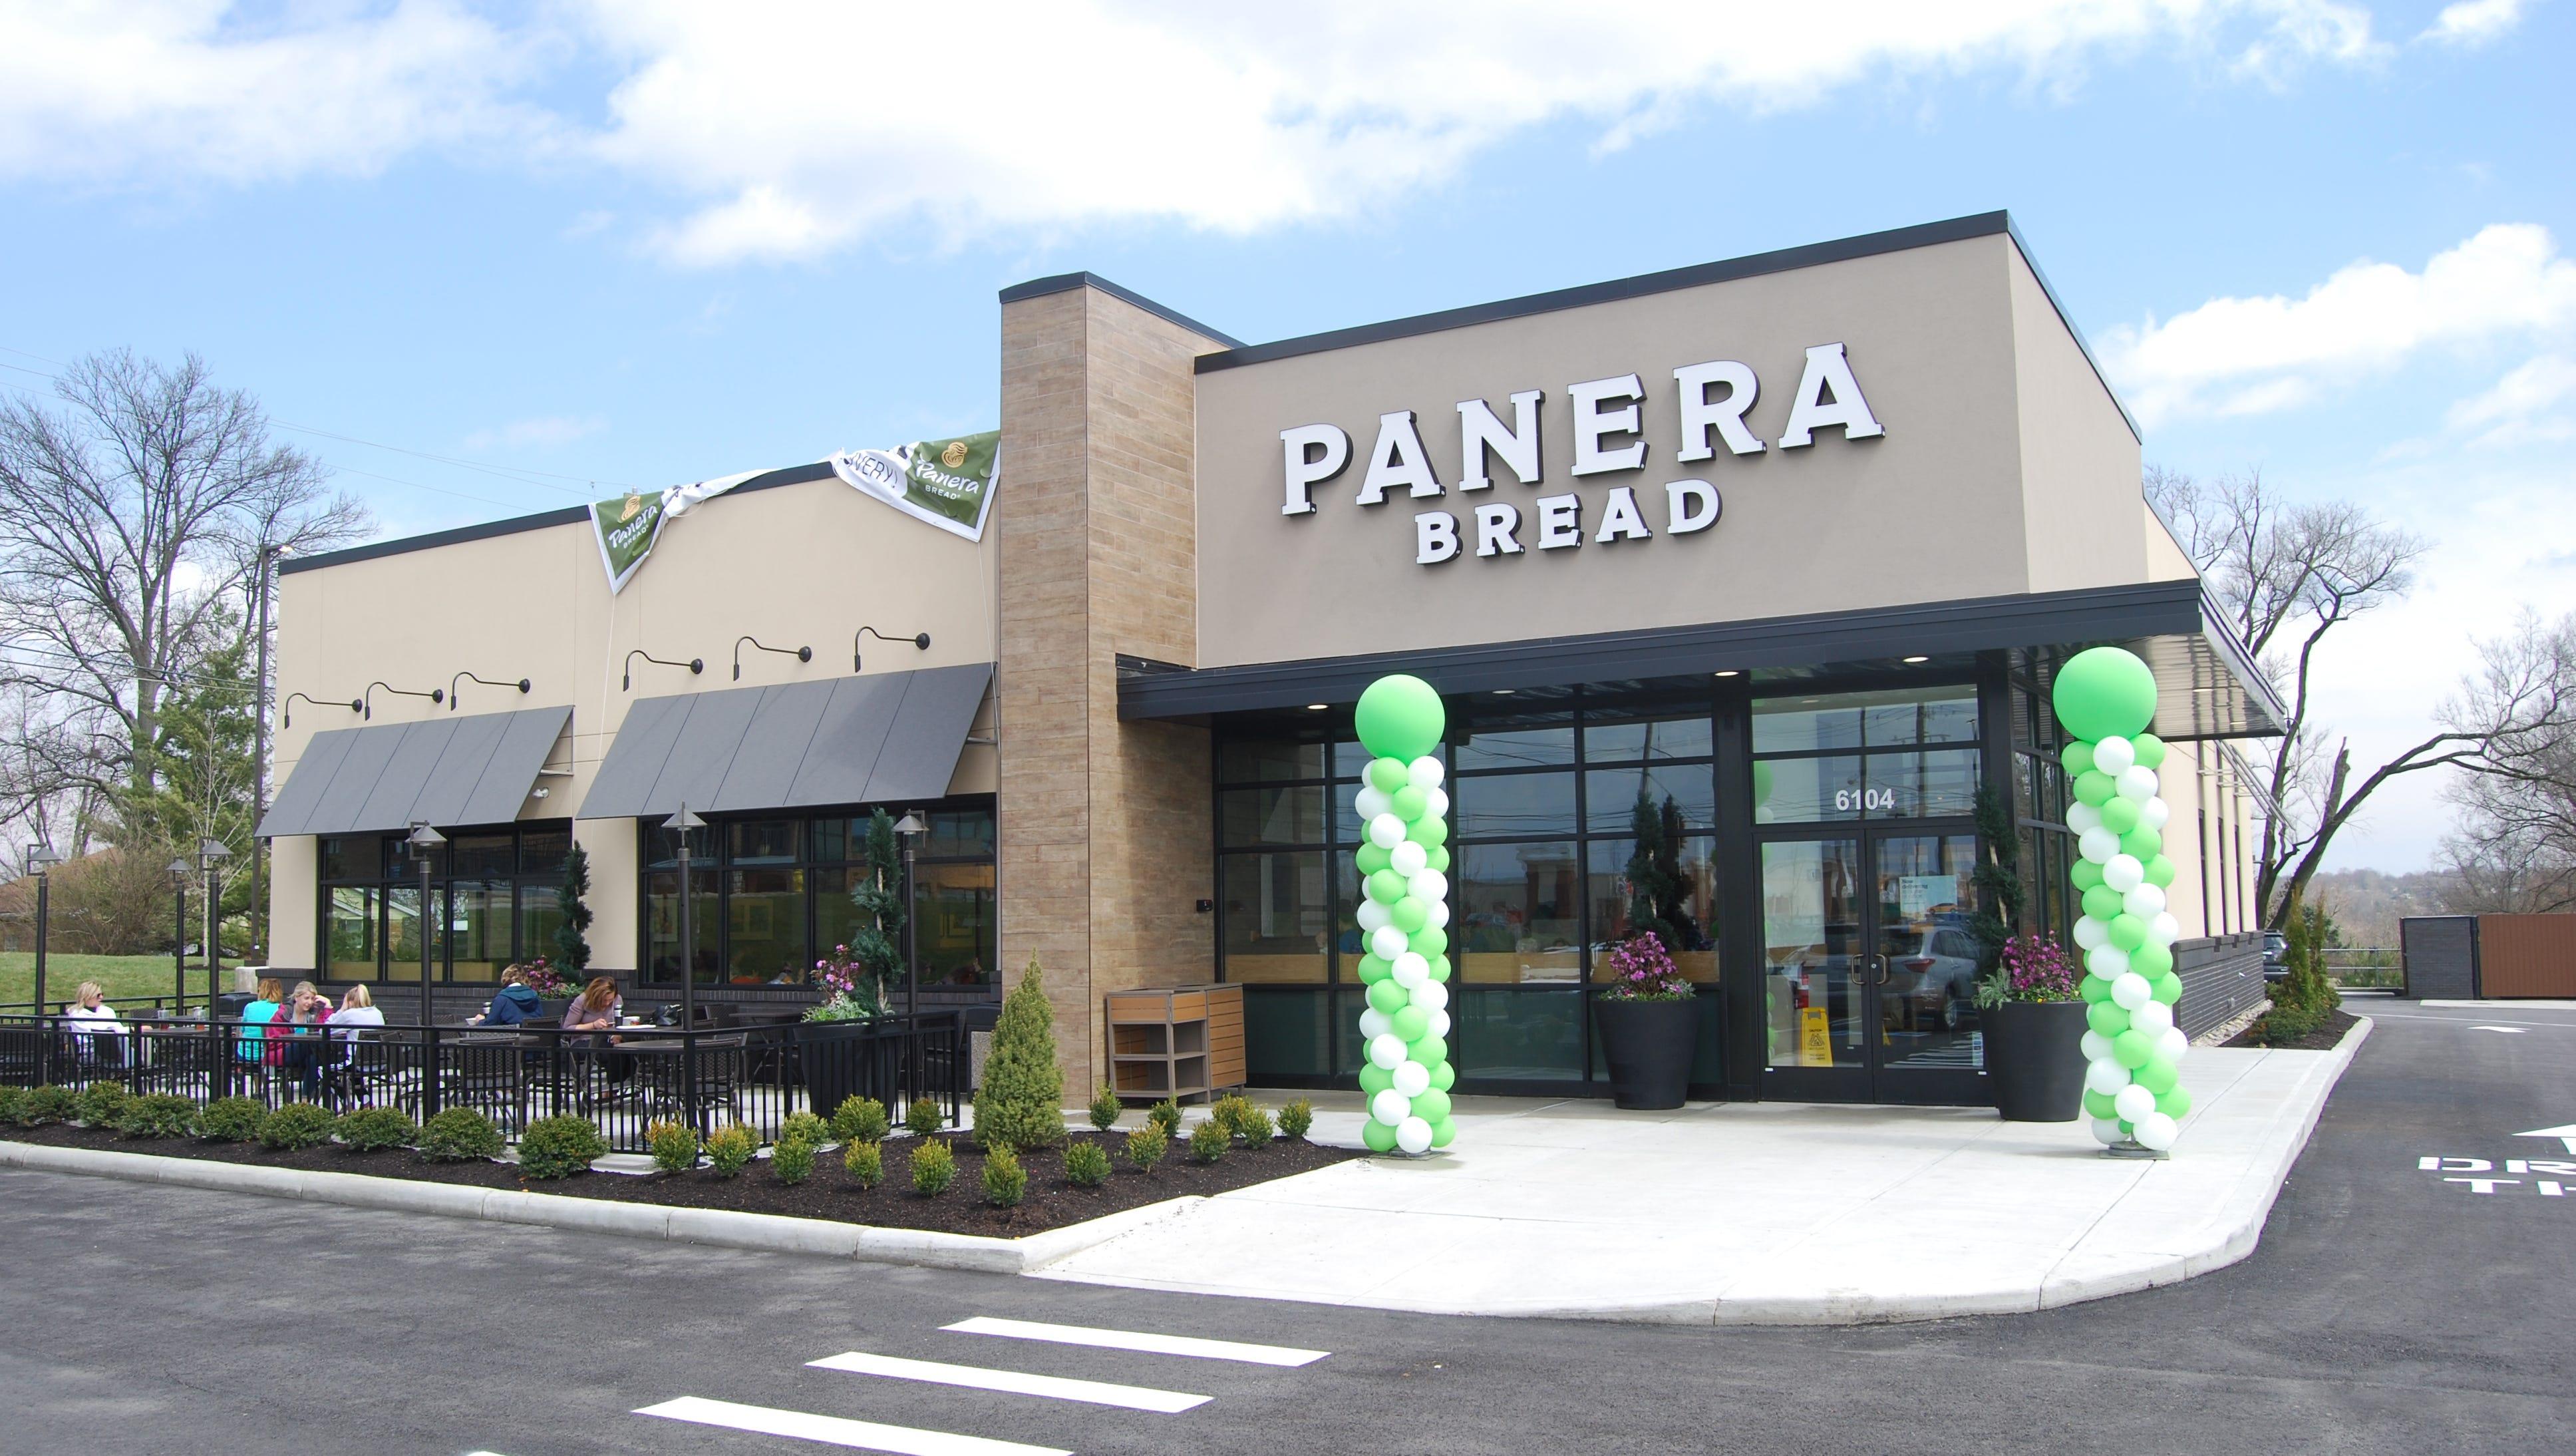 cincinnati.com - Chris Mayhew, Cincinnati Enquirer - Panera plans Union restaurant outside Kroger Marketplace